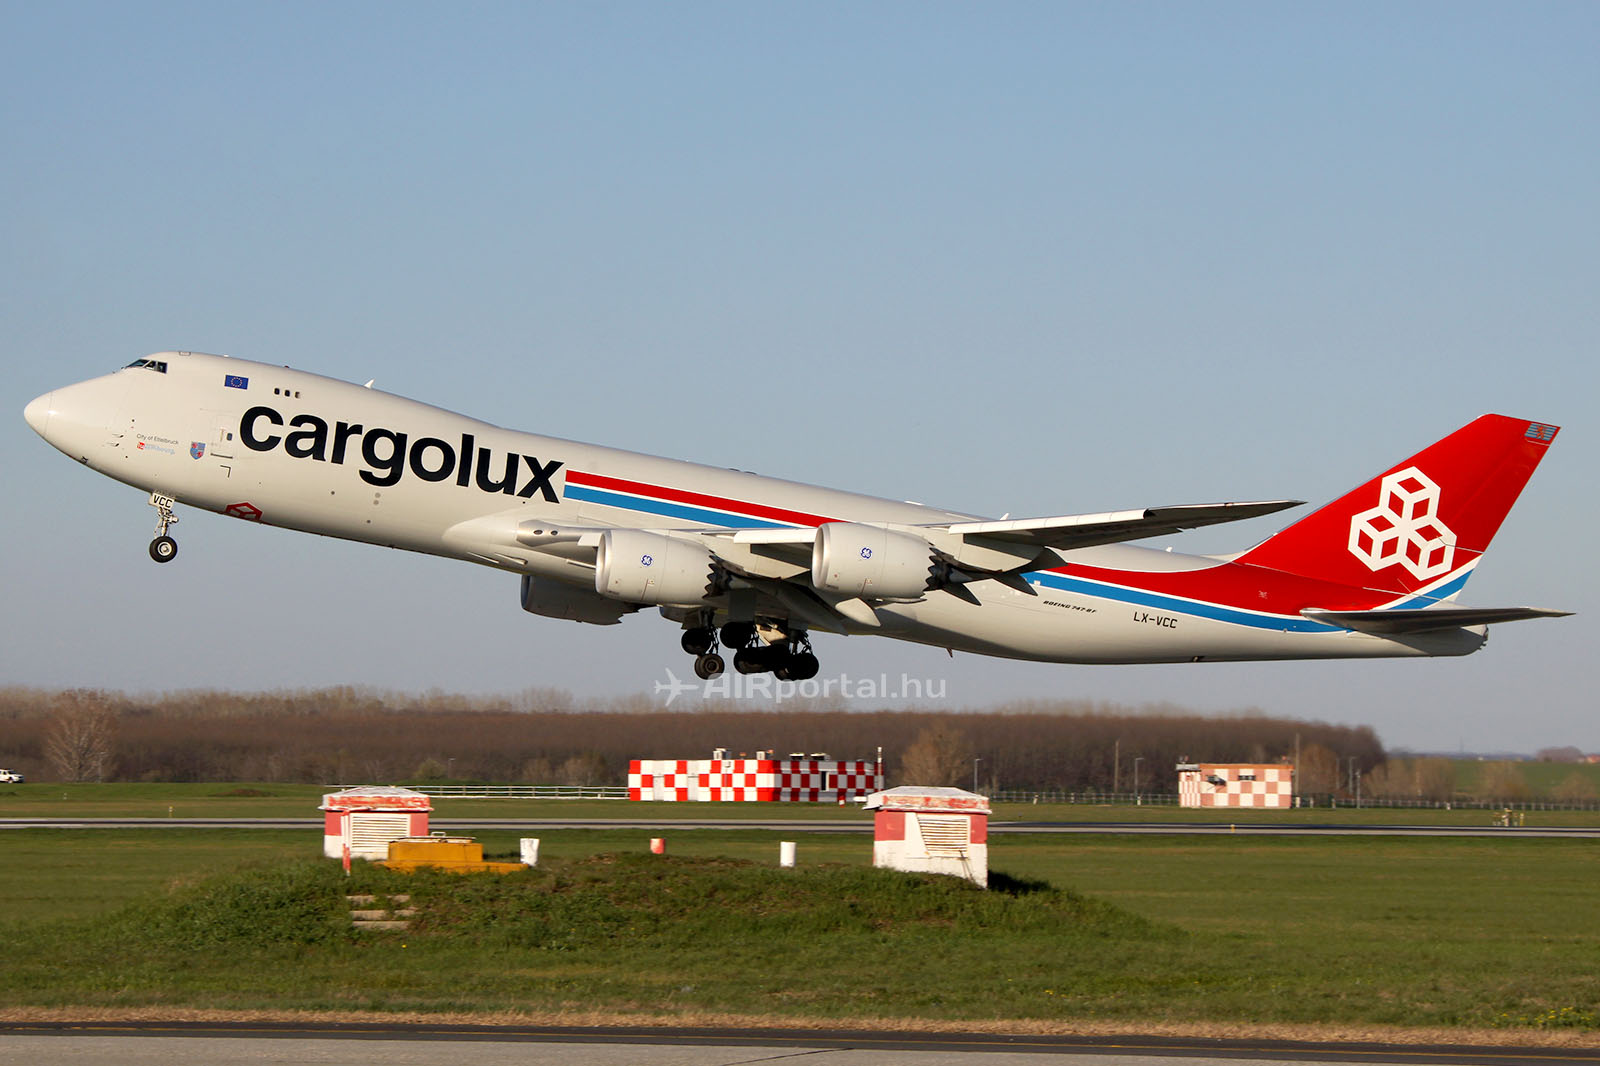 A Cargolux Boeing 747-8F típusú gépe. (Fotó: AIRportal.hu) | © AIRportal.hu